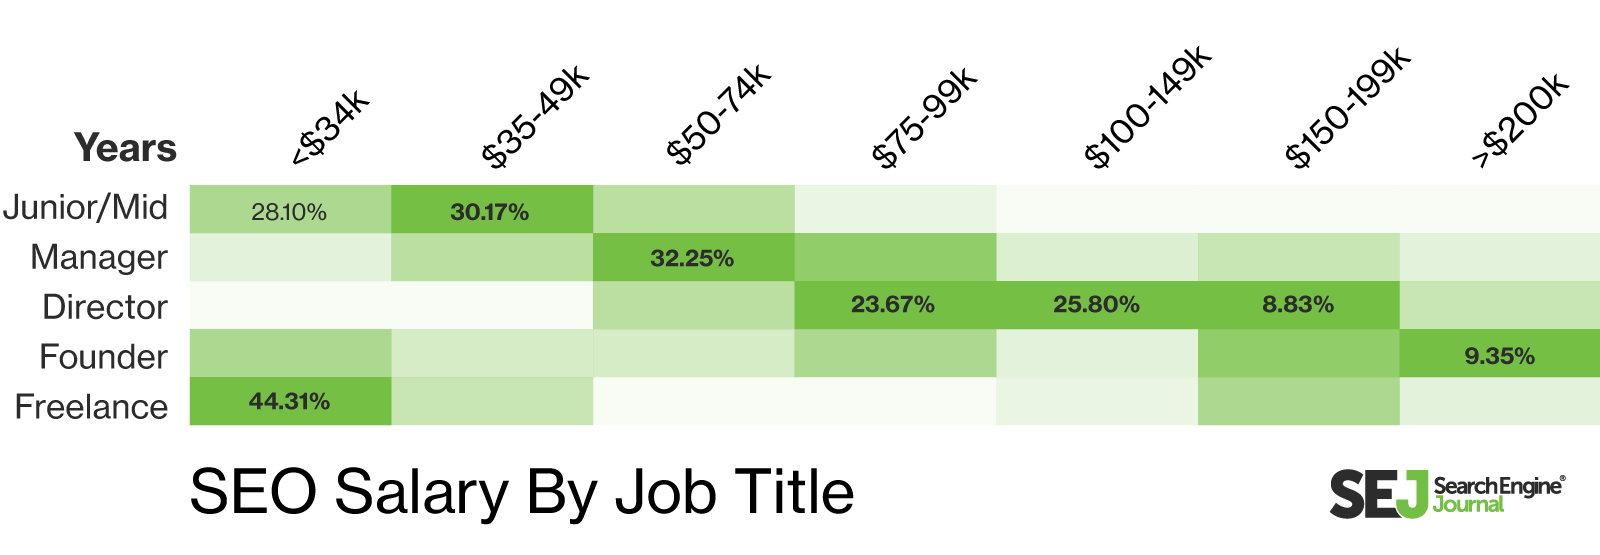 SEO Salary by Job Title